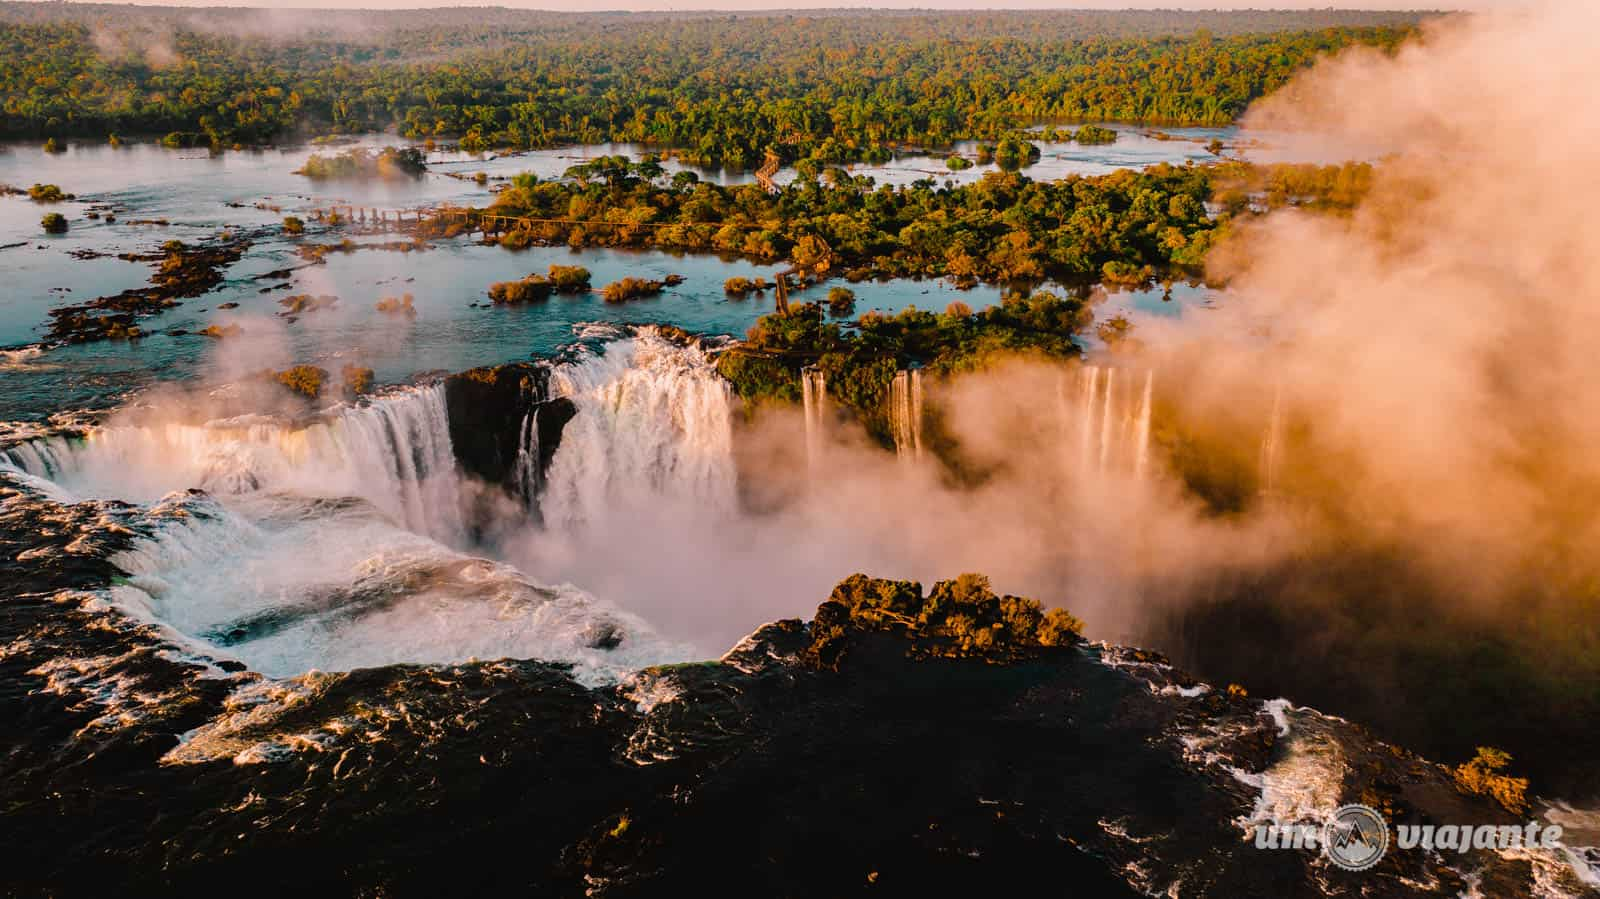 Voo de Helicóptero Cataratas do Iguaçu